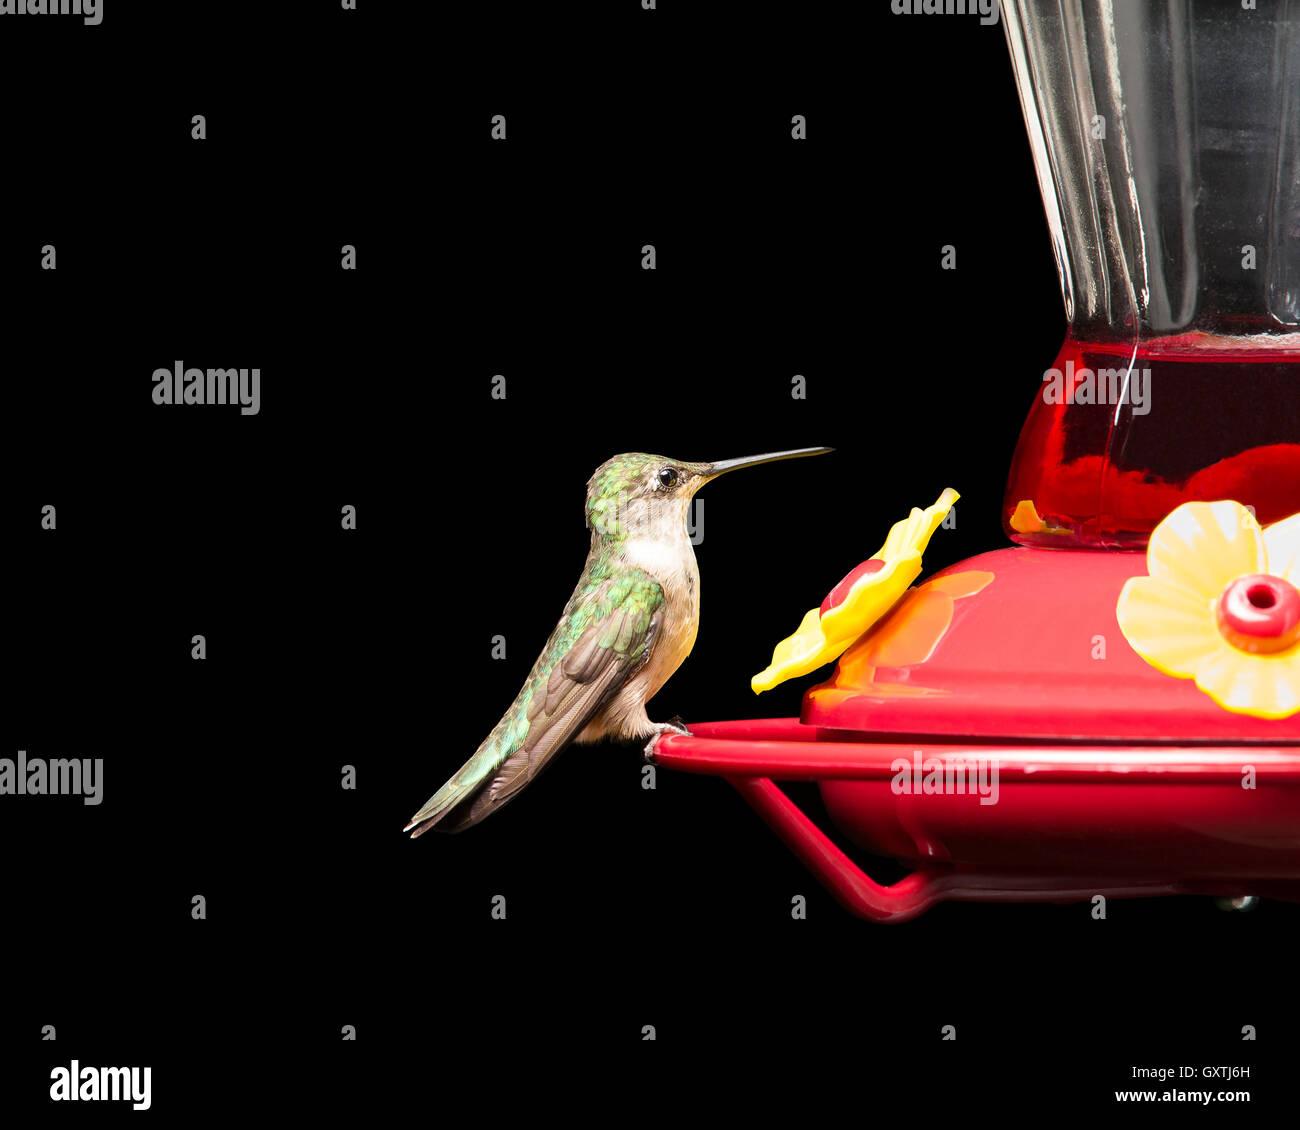 Großartig Süsse Kolibri Malvorlagen Ideen - Entry Level Resume ...